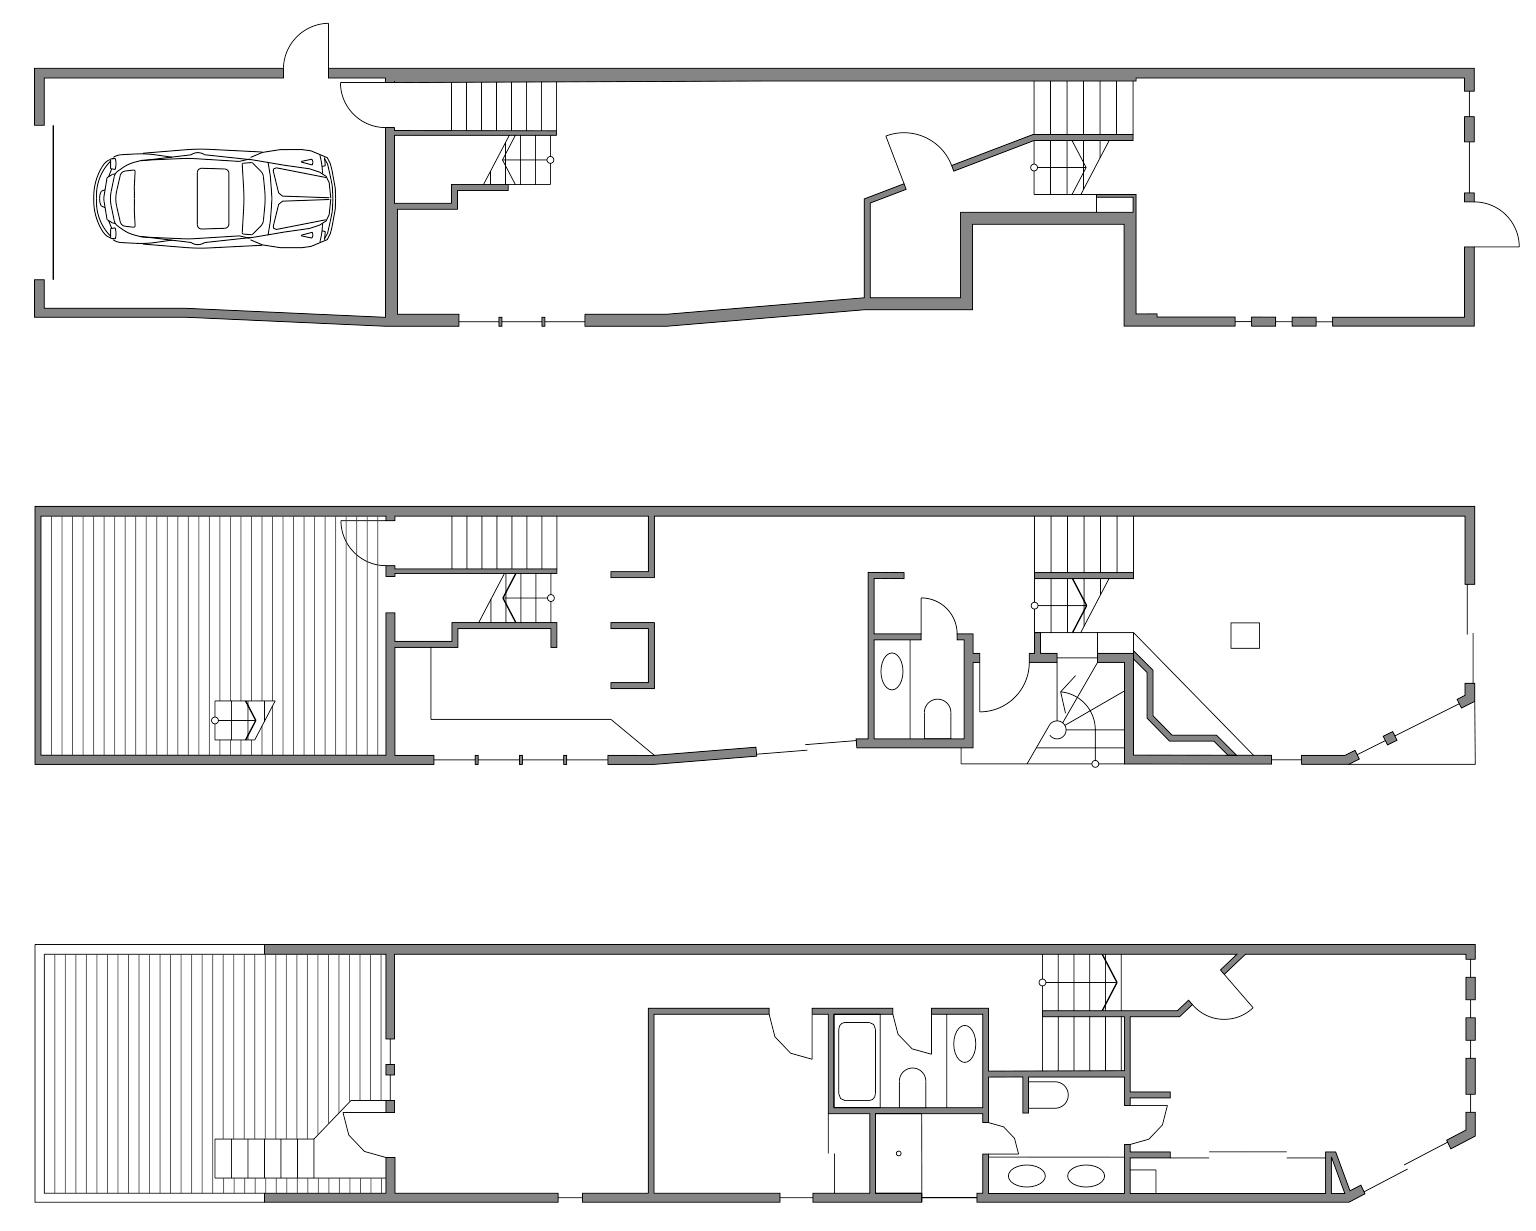 cohlmeyer-architecture-residential-design7.jpg